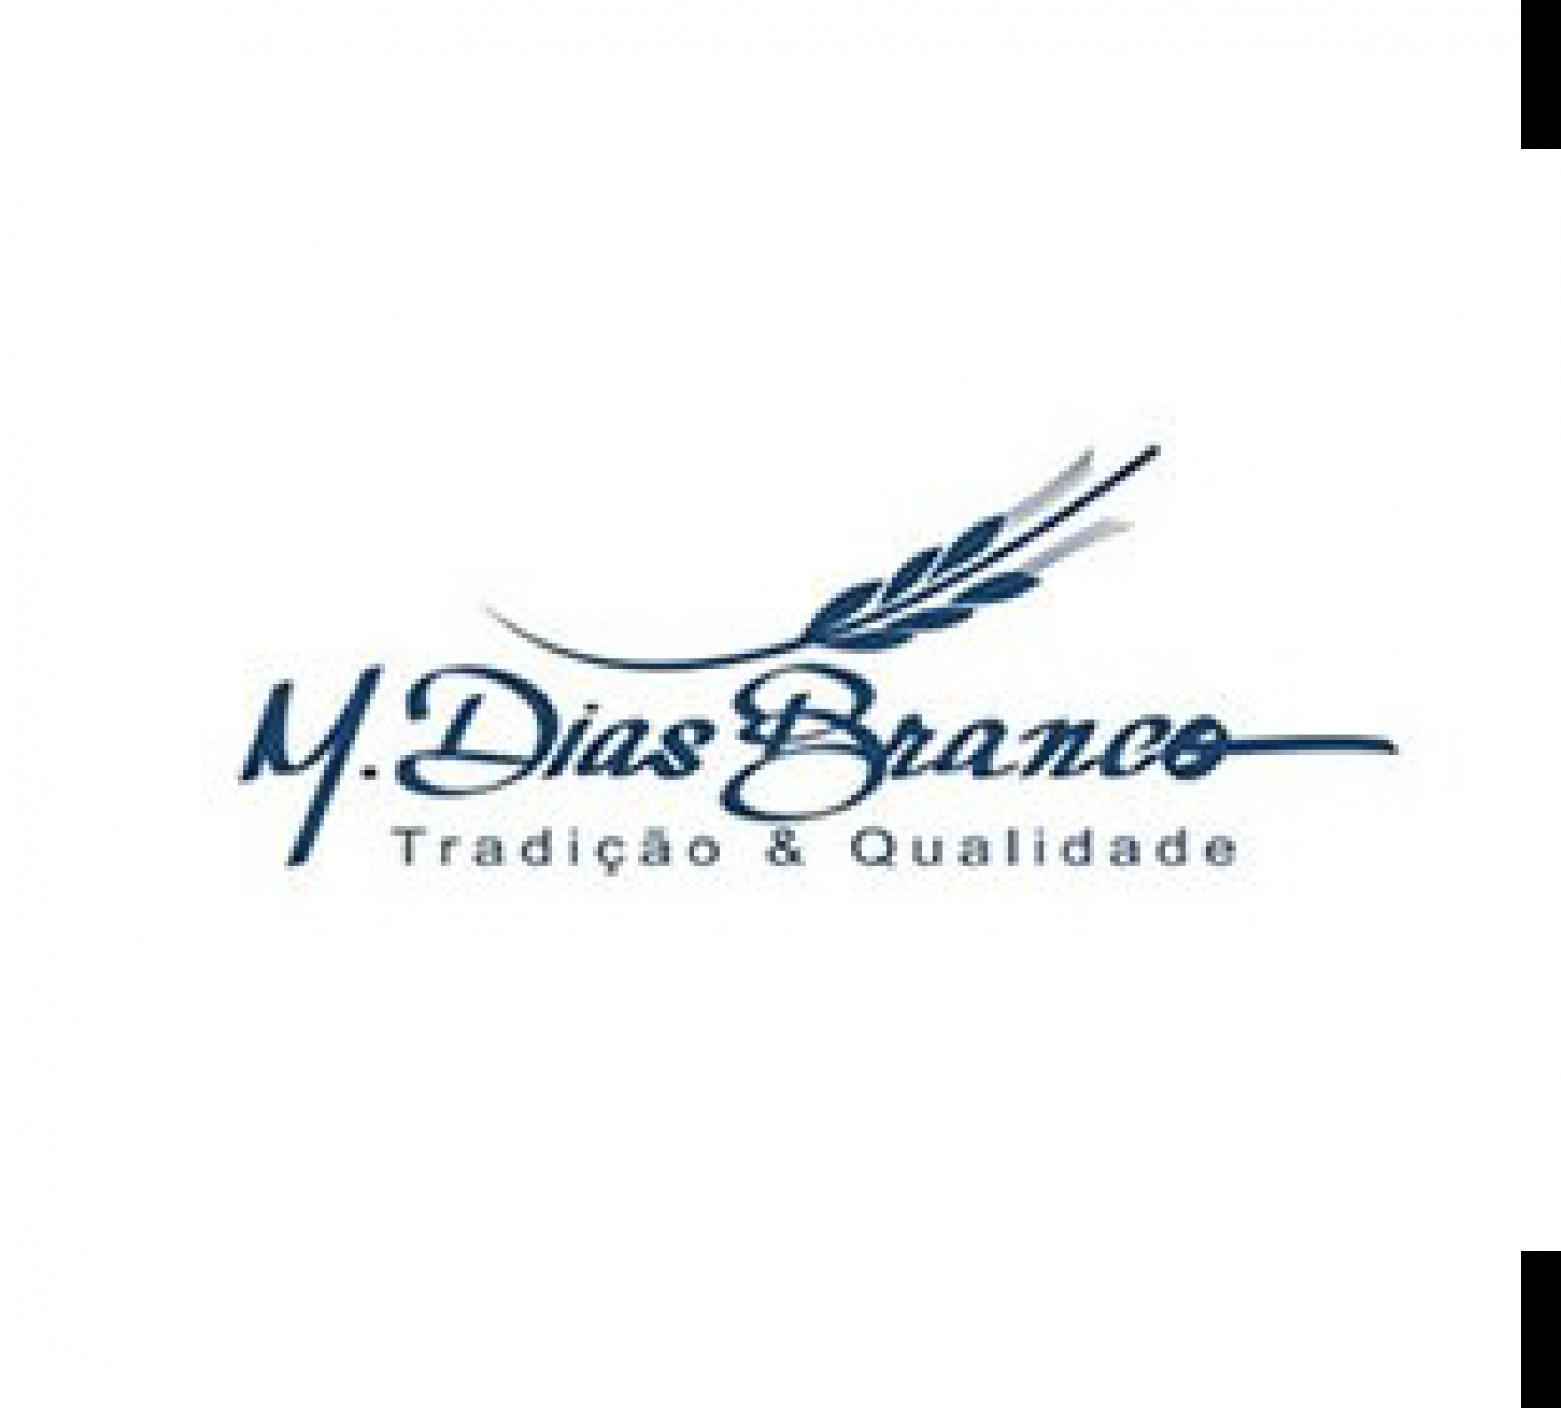 M. DIAS BRANCO